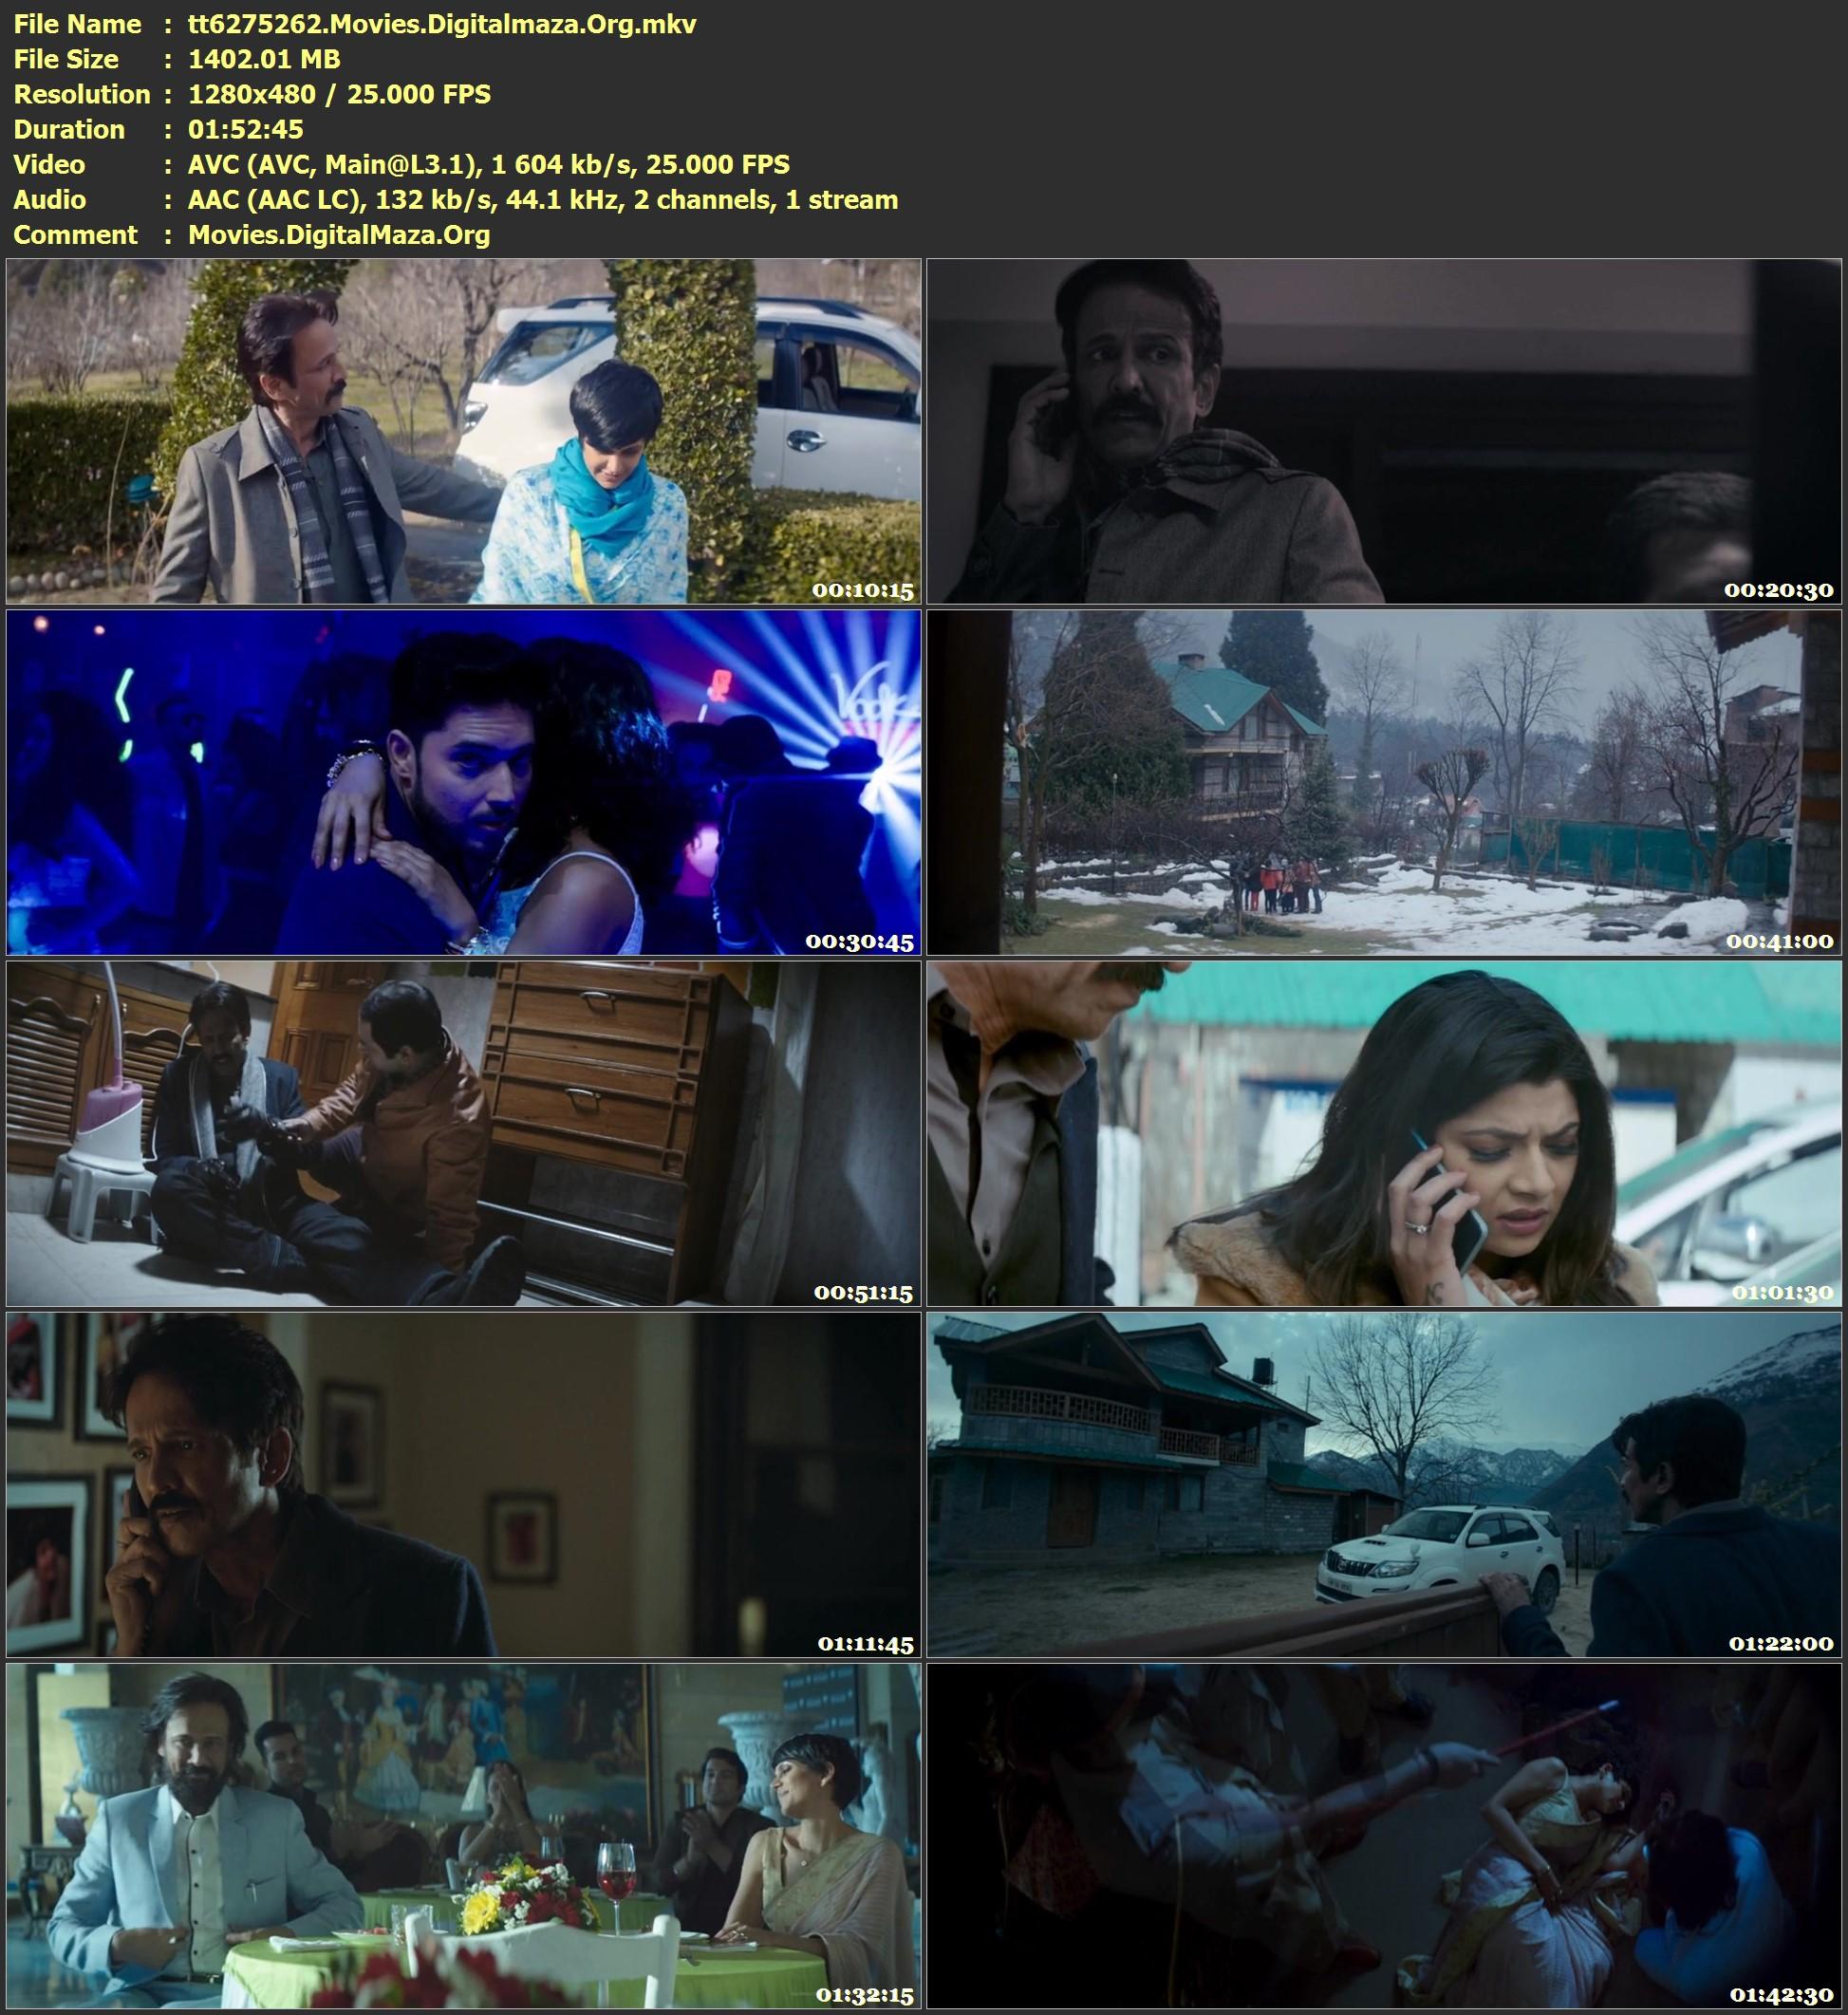 https://image.ibb.co/iCAi9y/tt6275262_Movies_Digitalmaza_Org_mkv.jpg